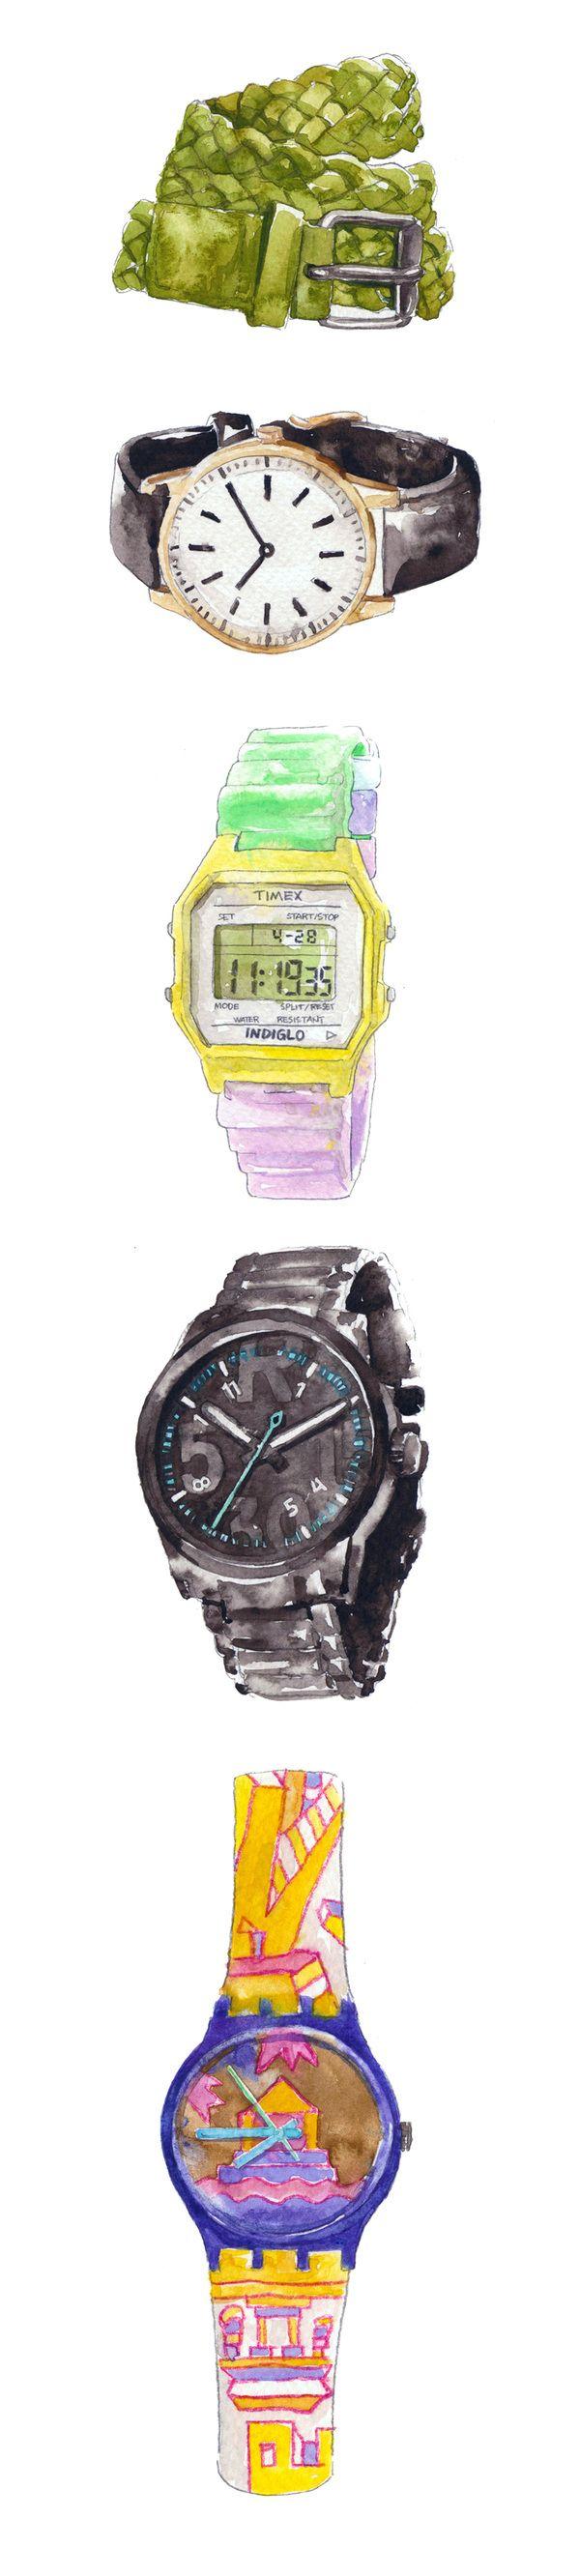 Top to Toe - Product drawings  | Bitchslap Magazine by Eunike Nugroho, via Behance